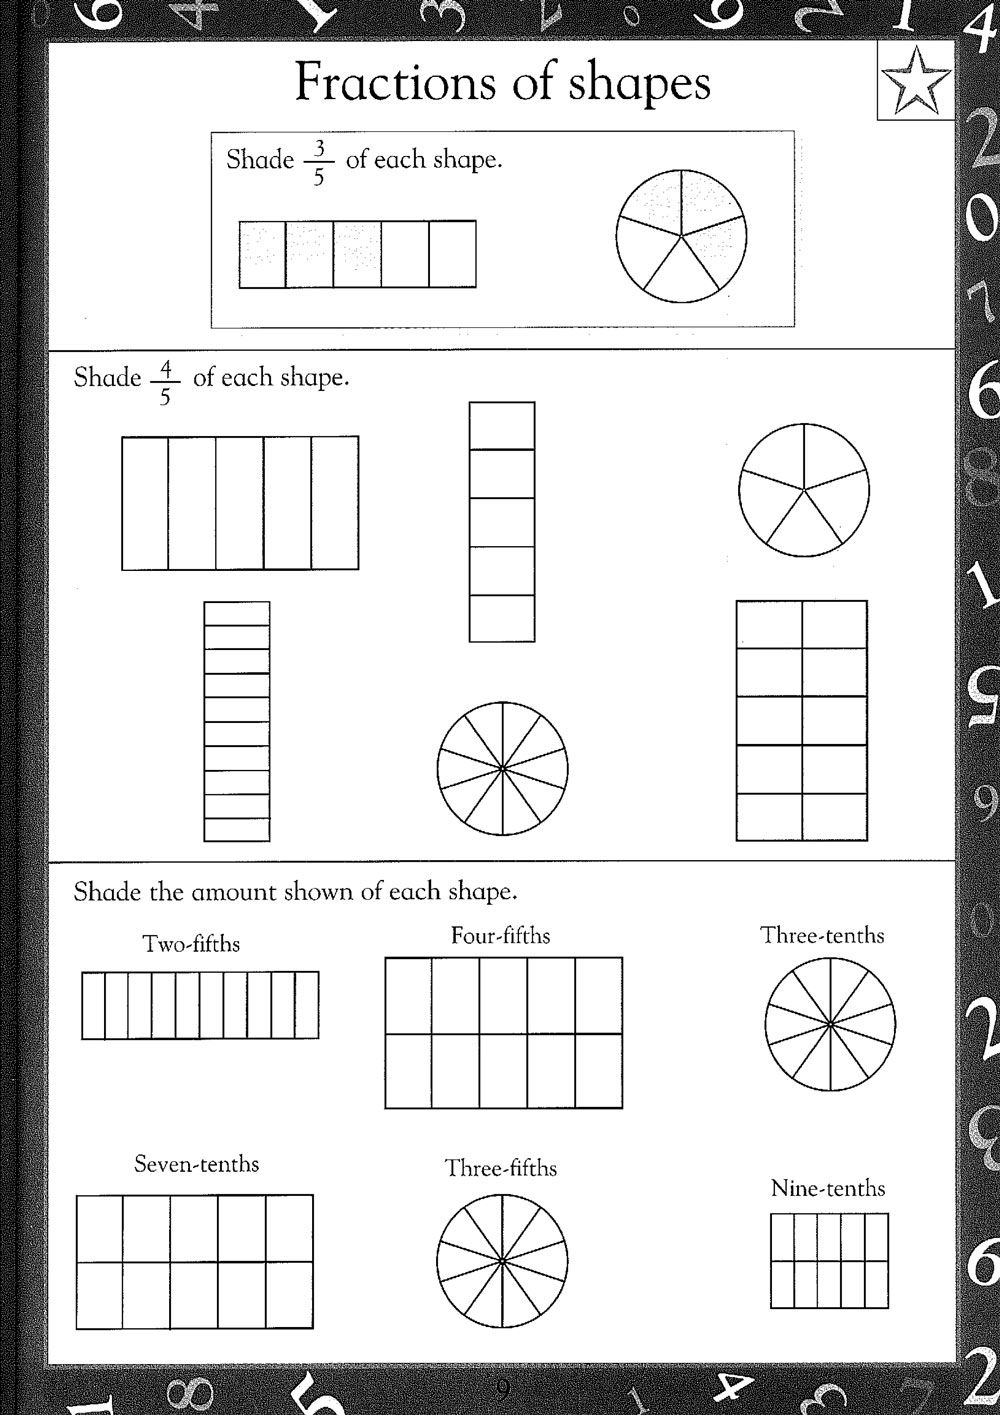 Free Printable Maths Worksheets Maths Worksheets For Kids Free Printable Math Worksheets Maths Worksheets Ks2 Kids Math Worksheets